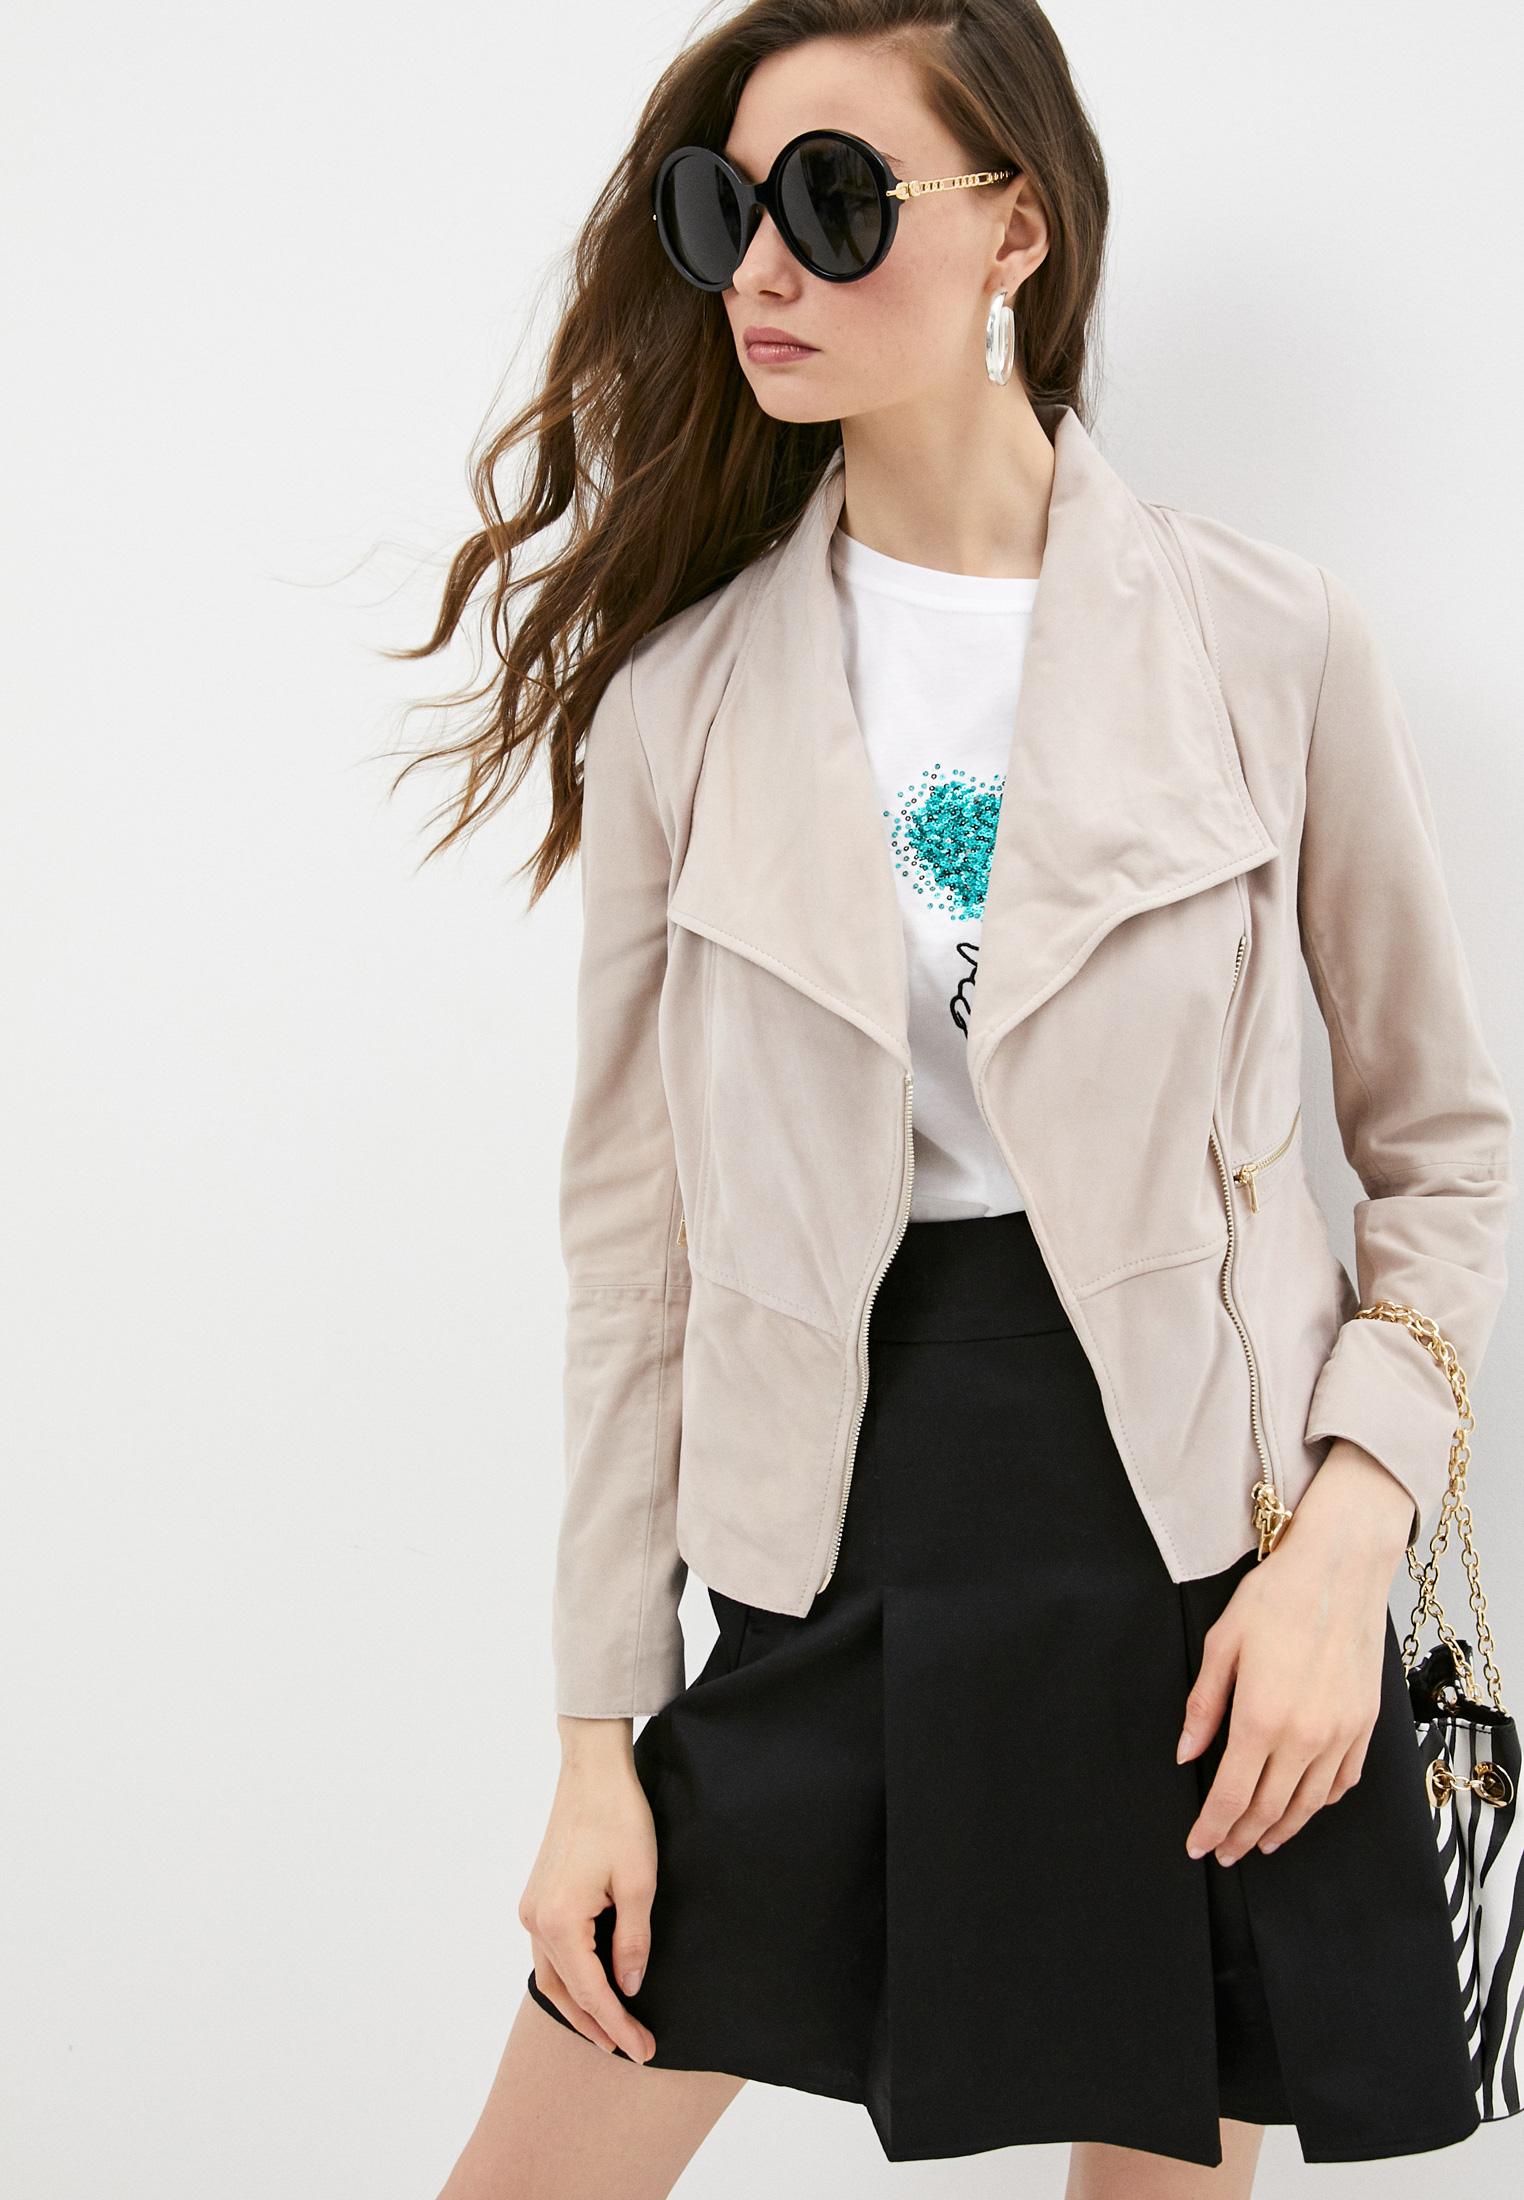 Кожаная куртка Pennyblack (Пенни Блэк) Куртка кожаная Pennyblack